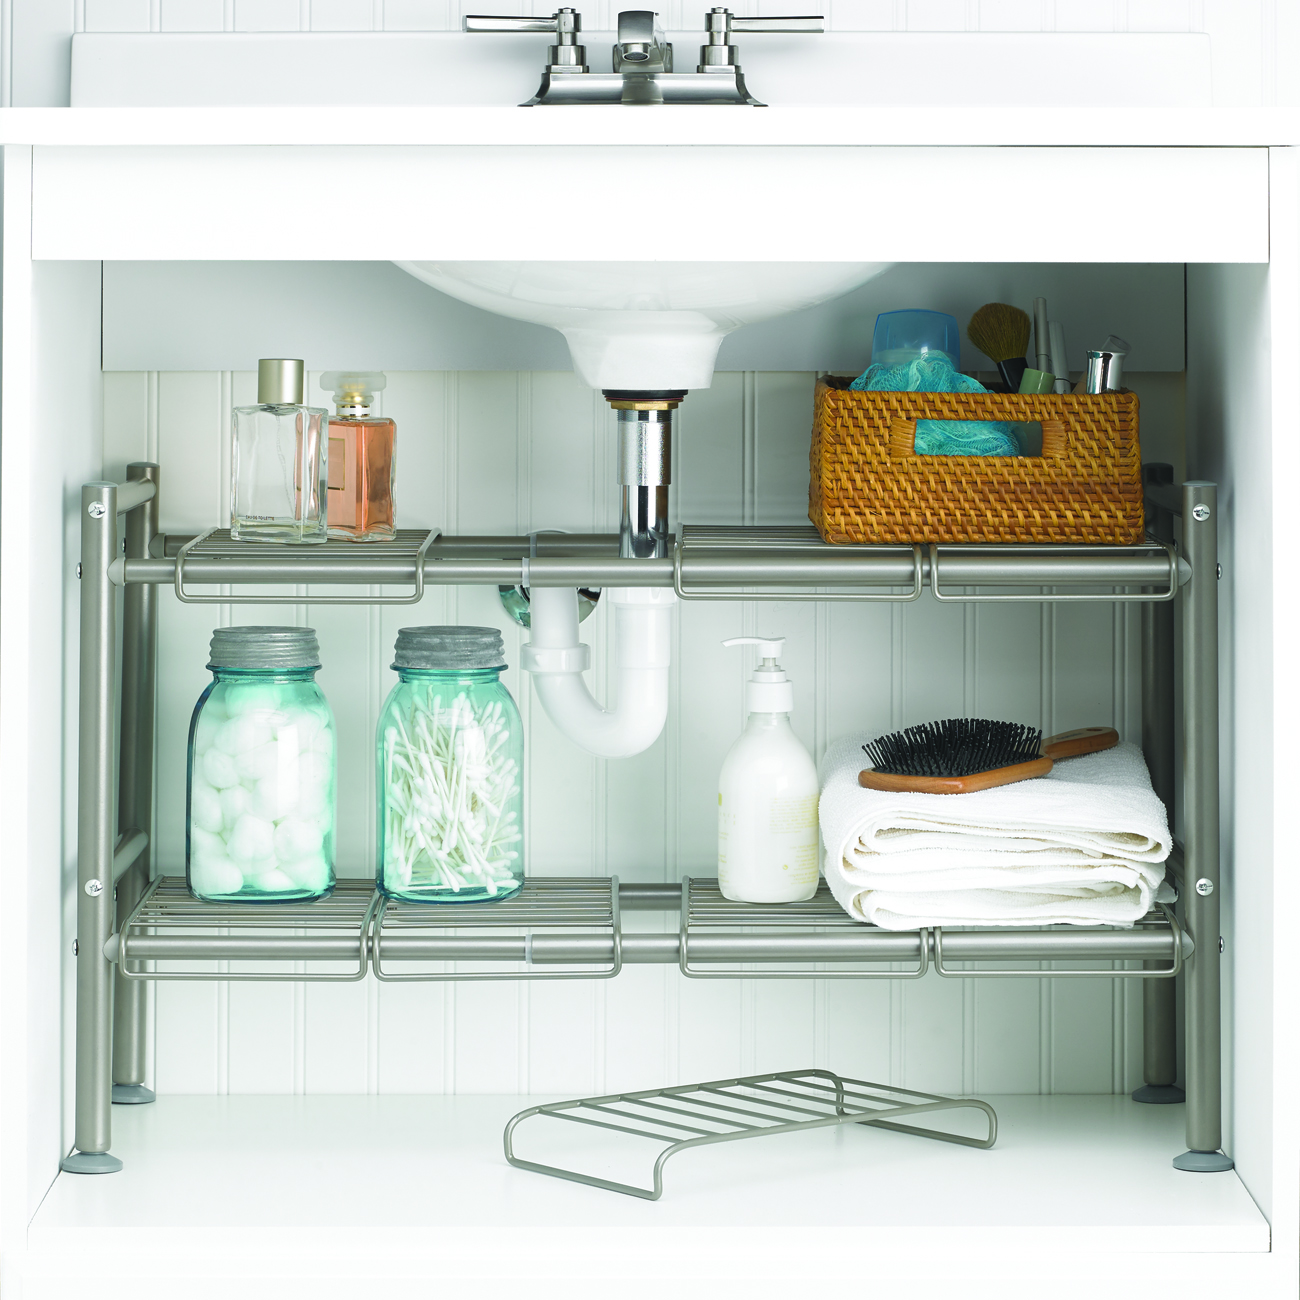 Undersink Storage Shelf.jpg